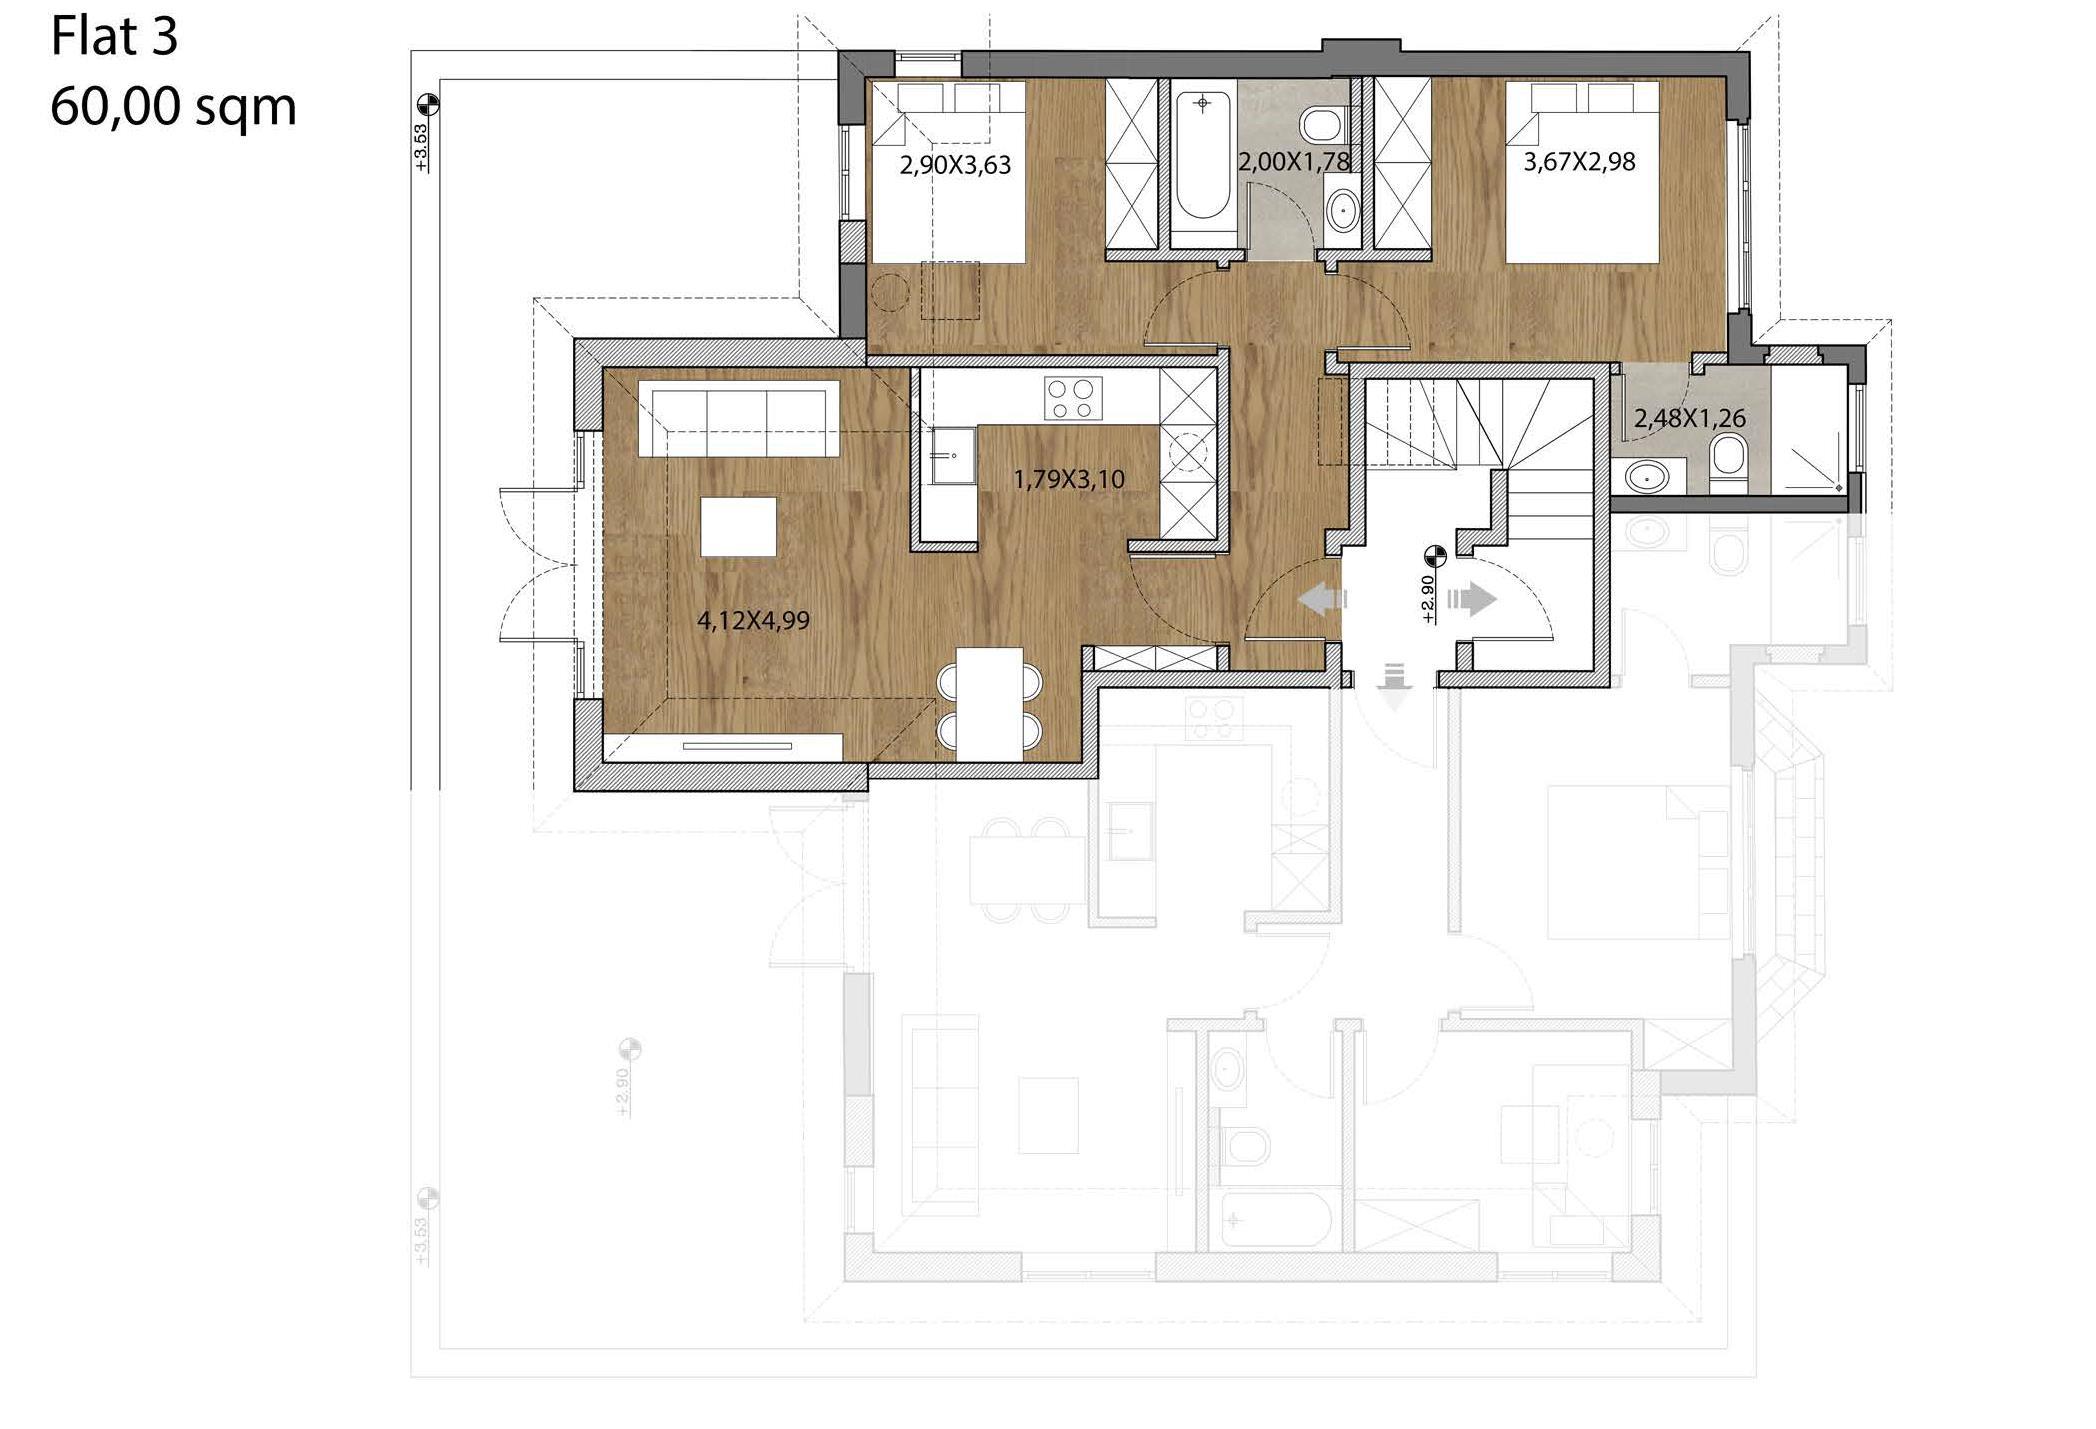 2 Bedroom Flat For Sale In Neeld Crescent Nw4 London